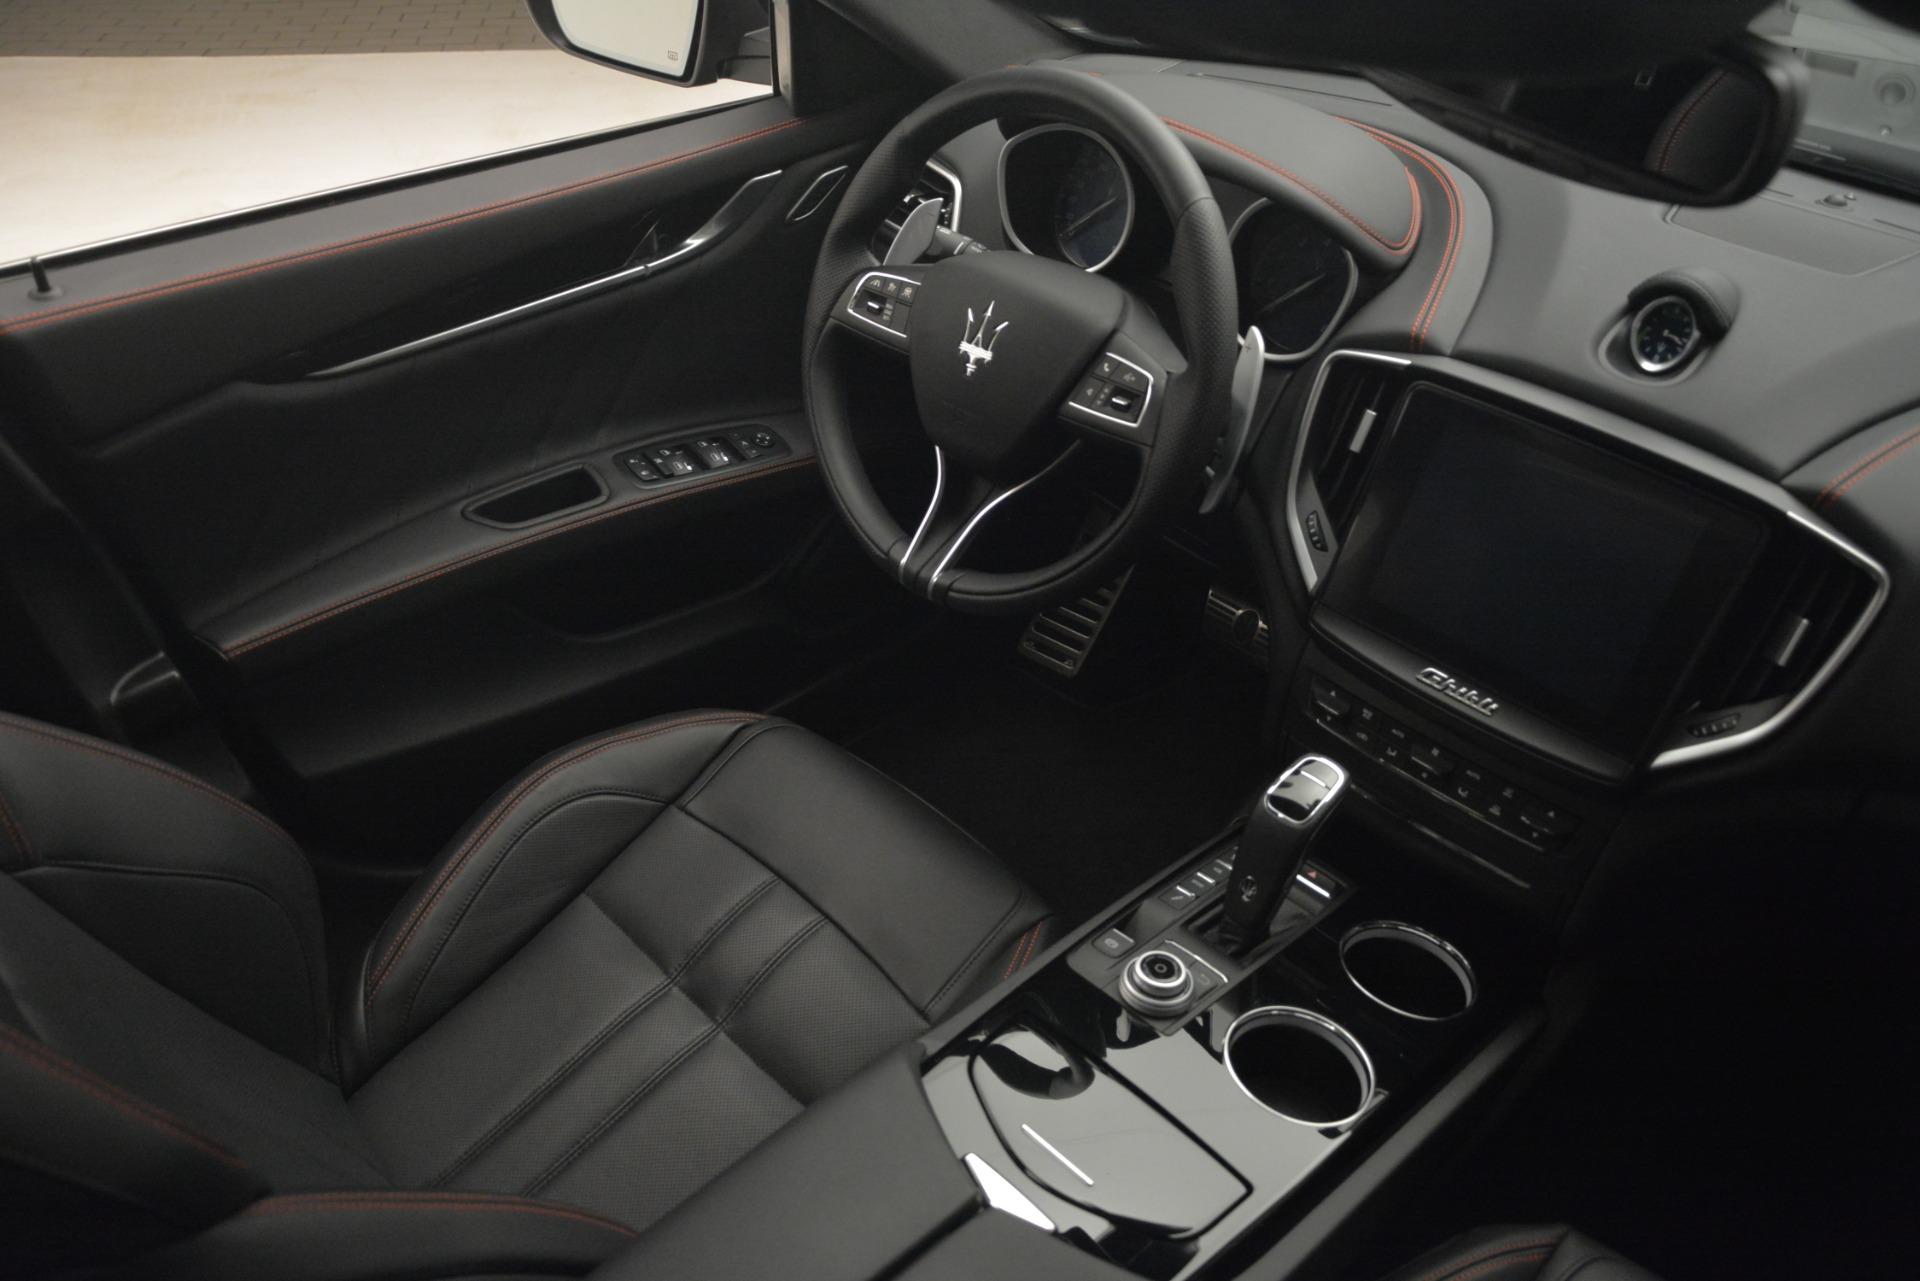 New 2019 Maserati Ghibli S Q4 GranSport For Sale In Westport, CT 2614_p16